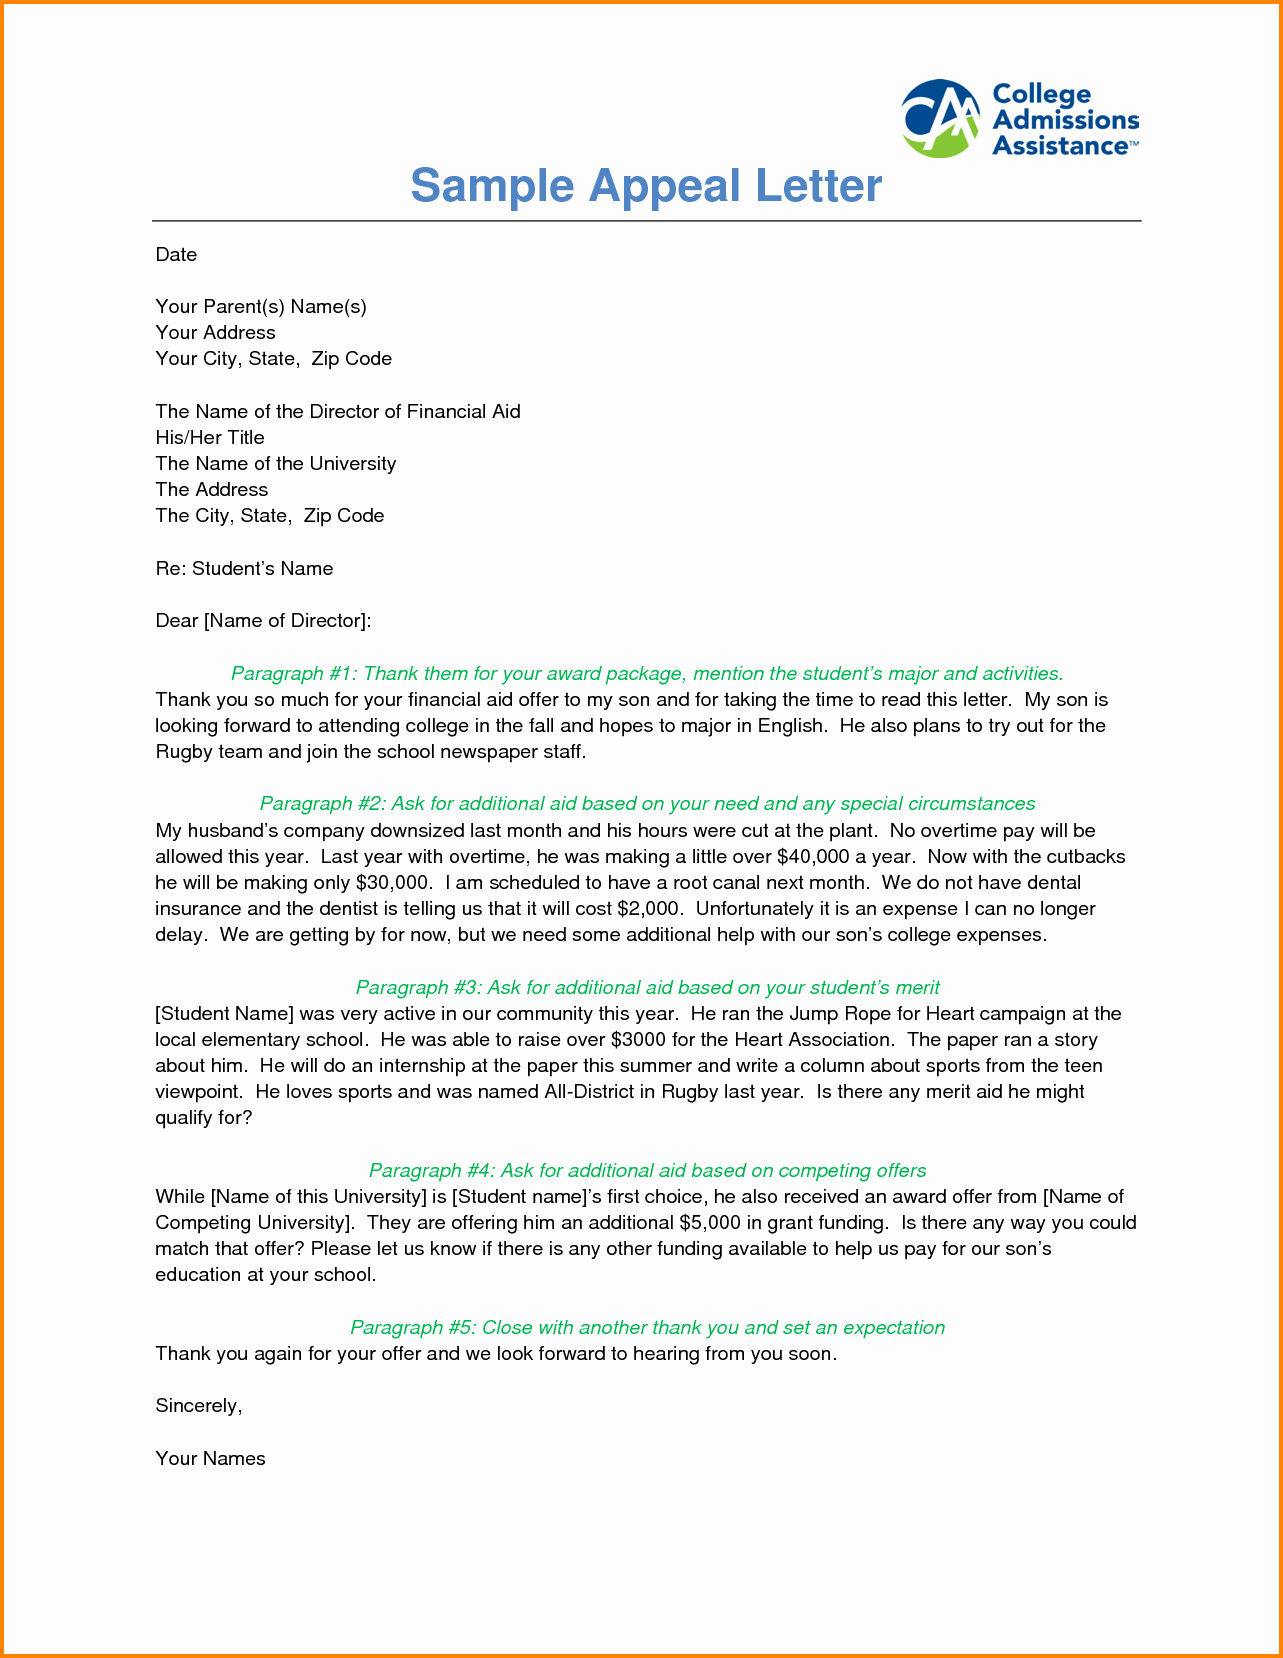 Sap Appeal Letter Fresh 6 Sap Appeal Example Letter